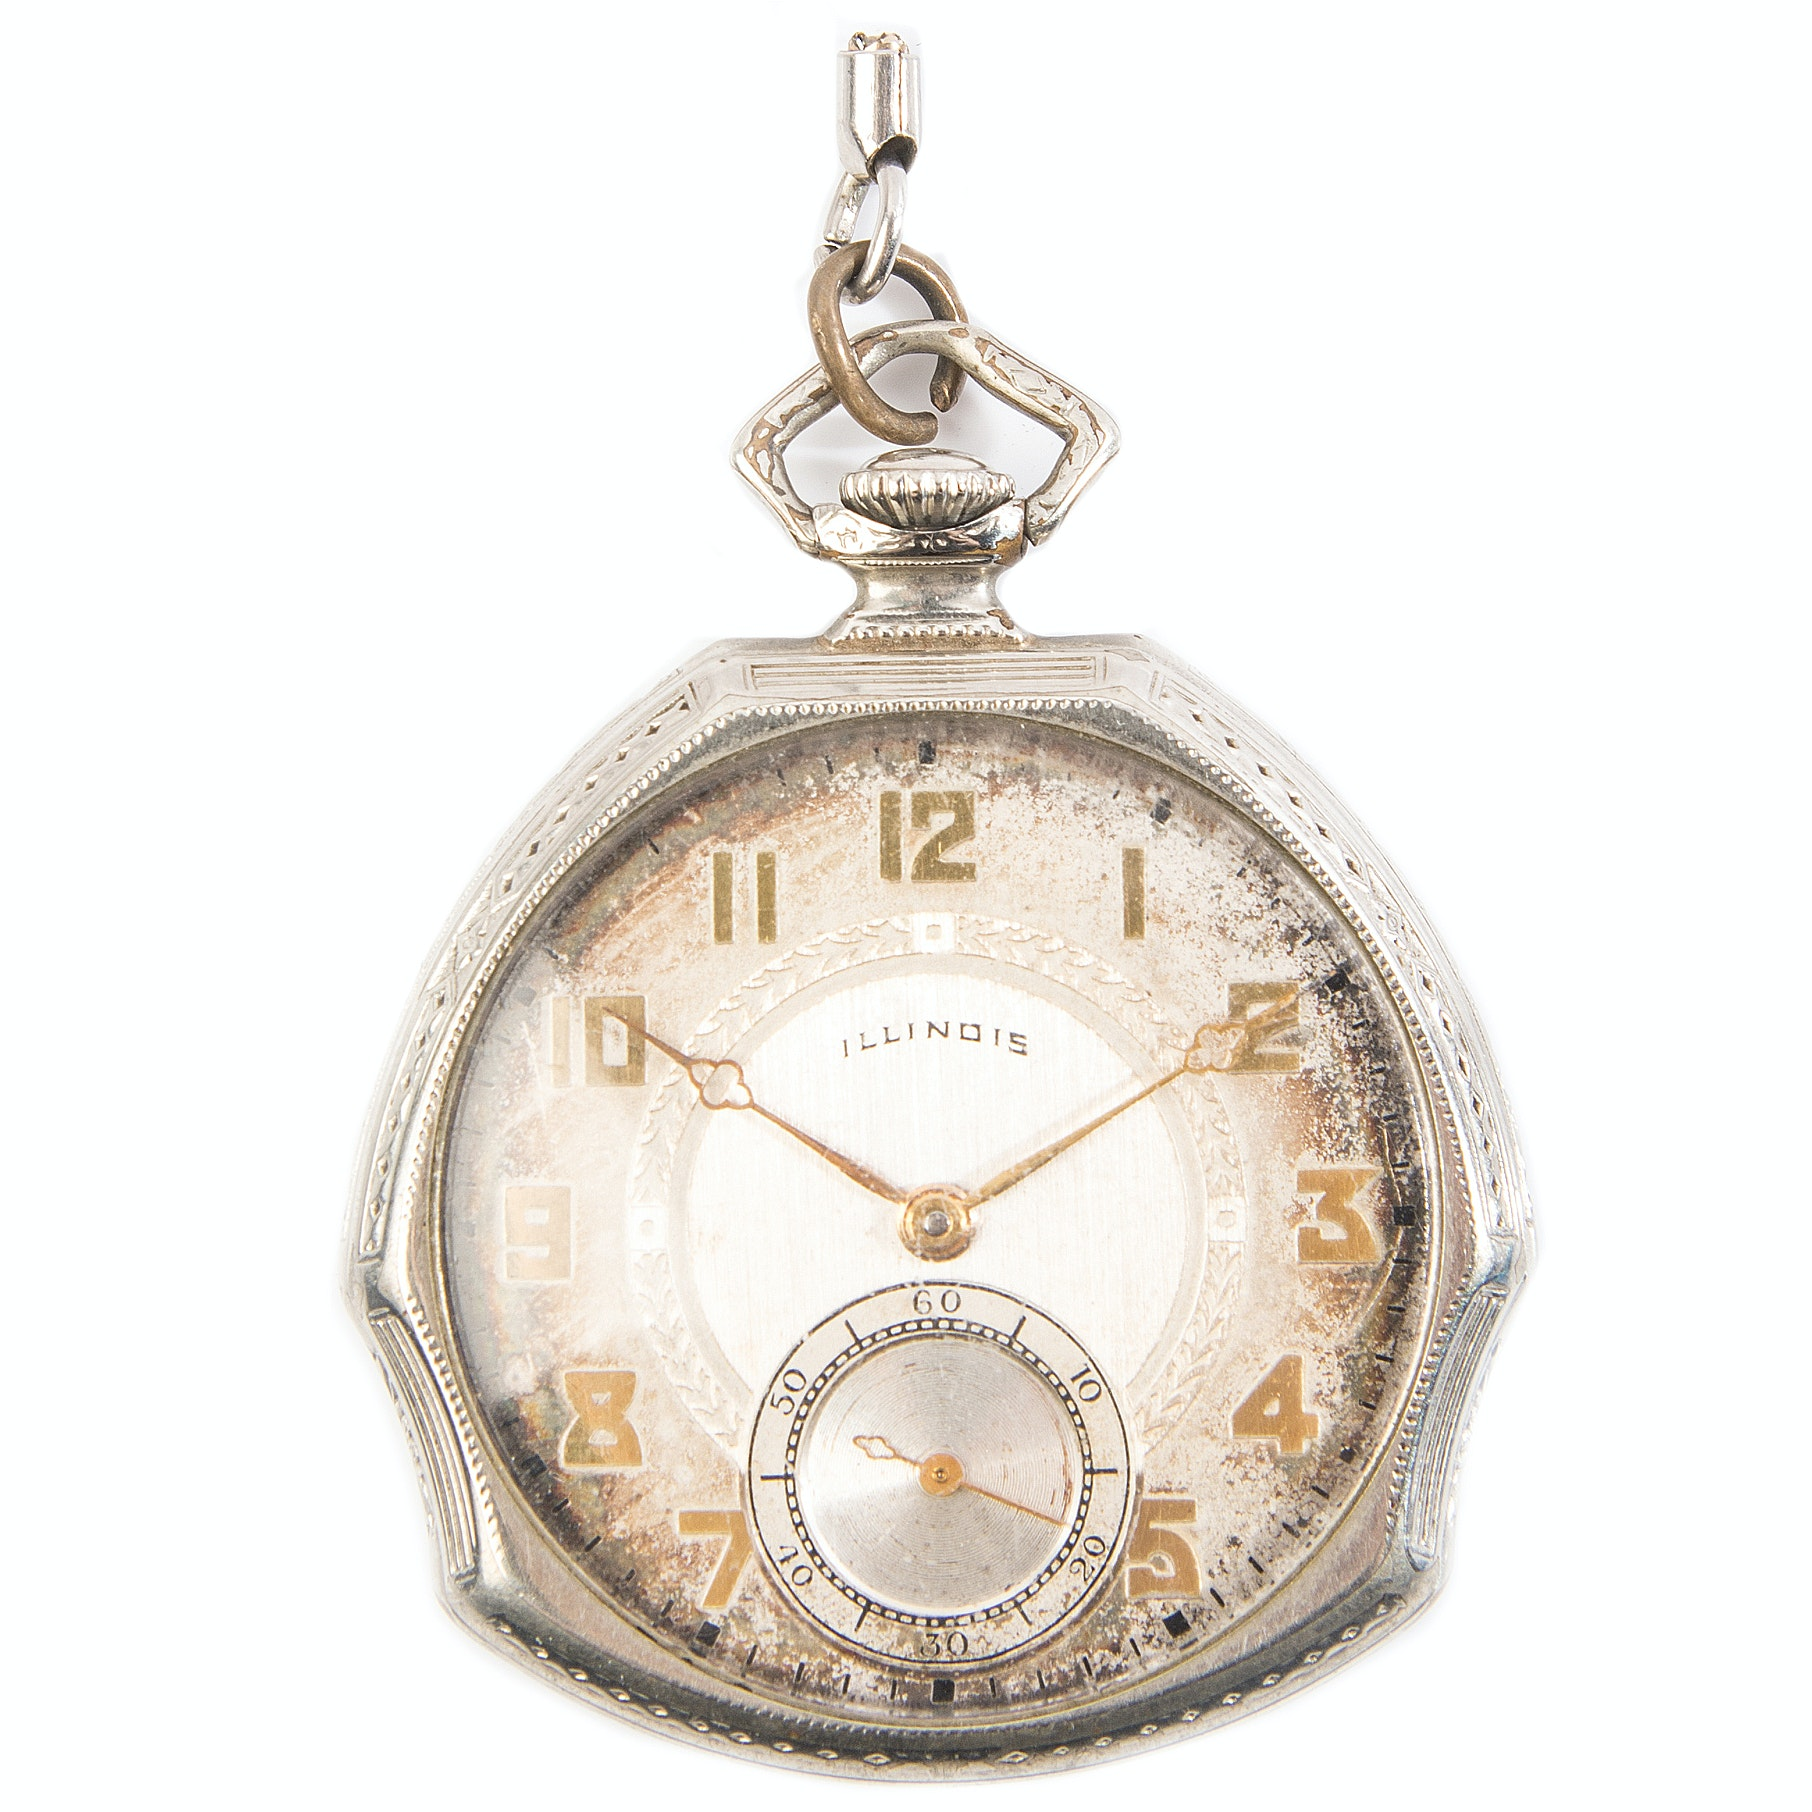 Vintage Illinois Gold-Filled Pocket Watch